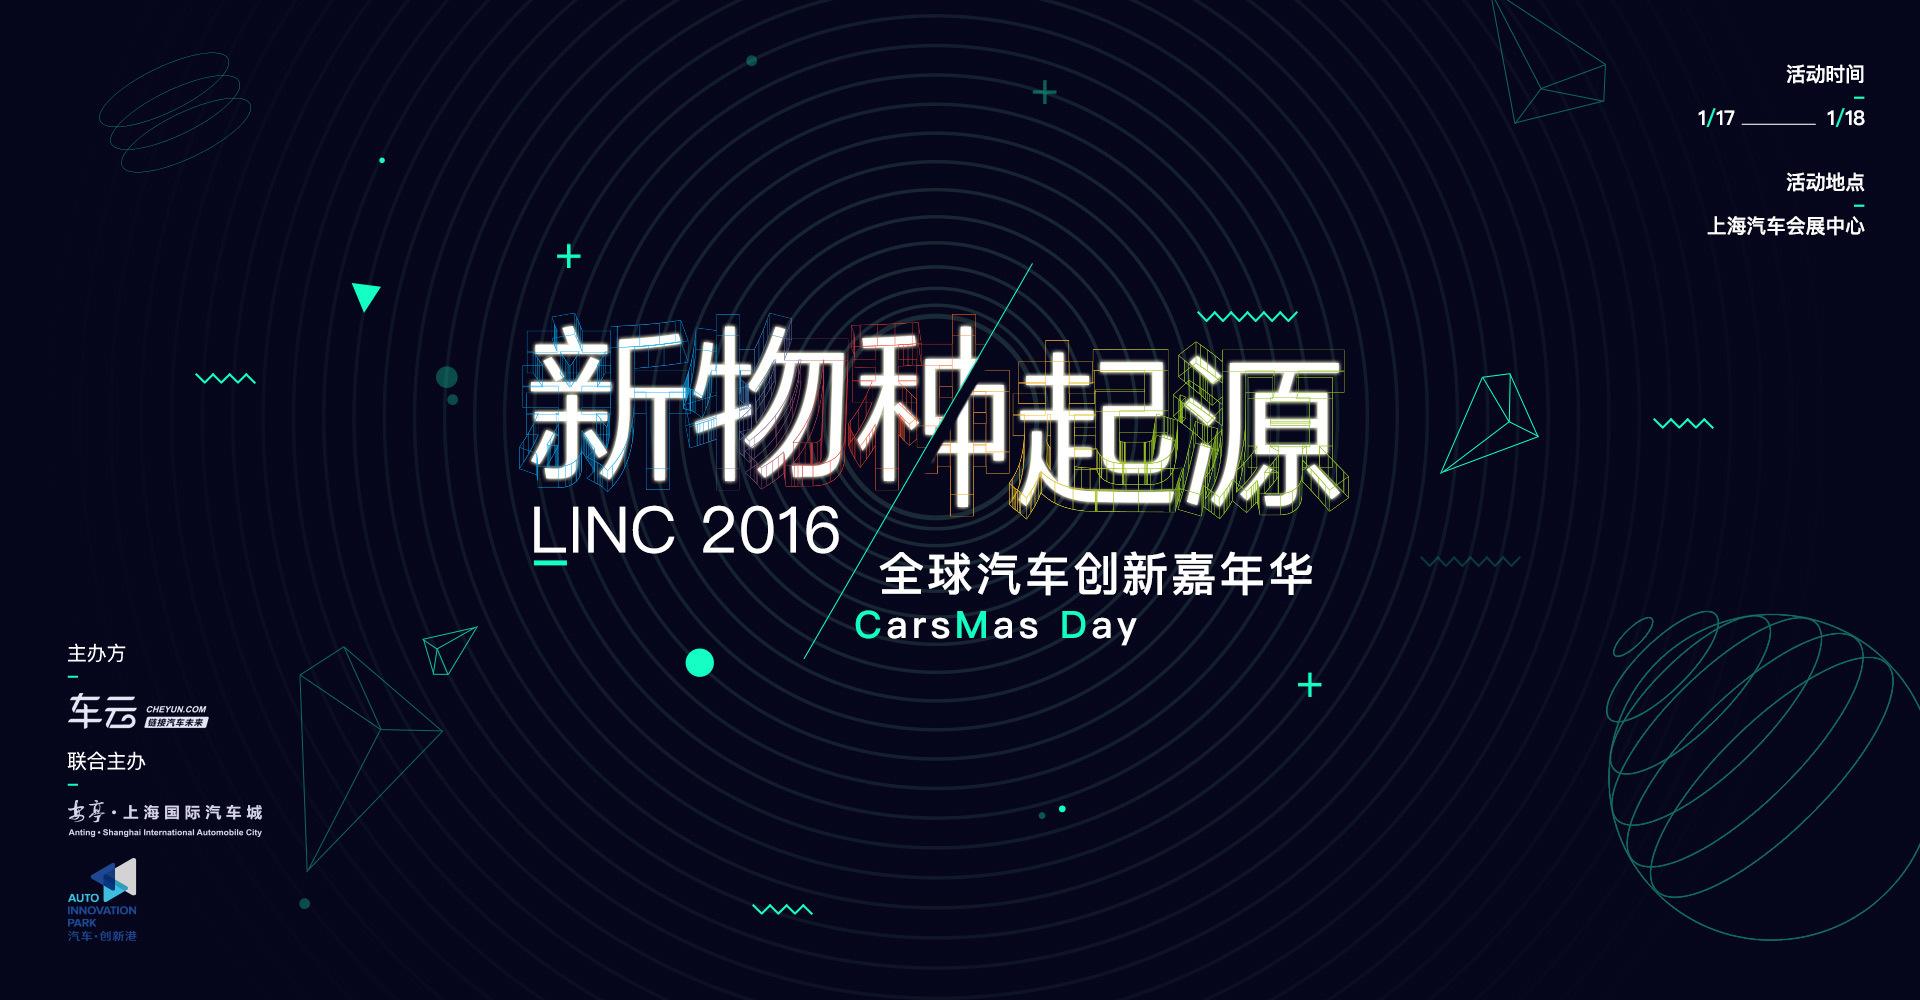 LINC2016『新物种起源』全球汽车创新嘉年华